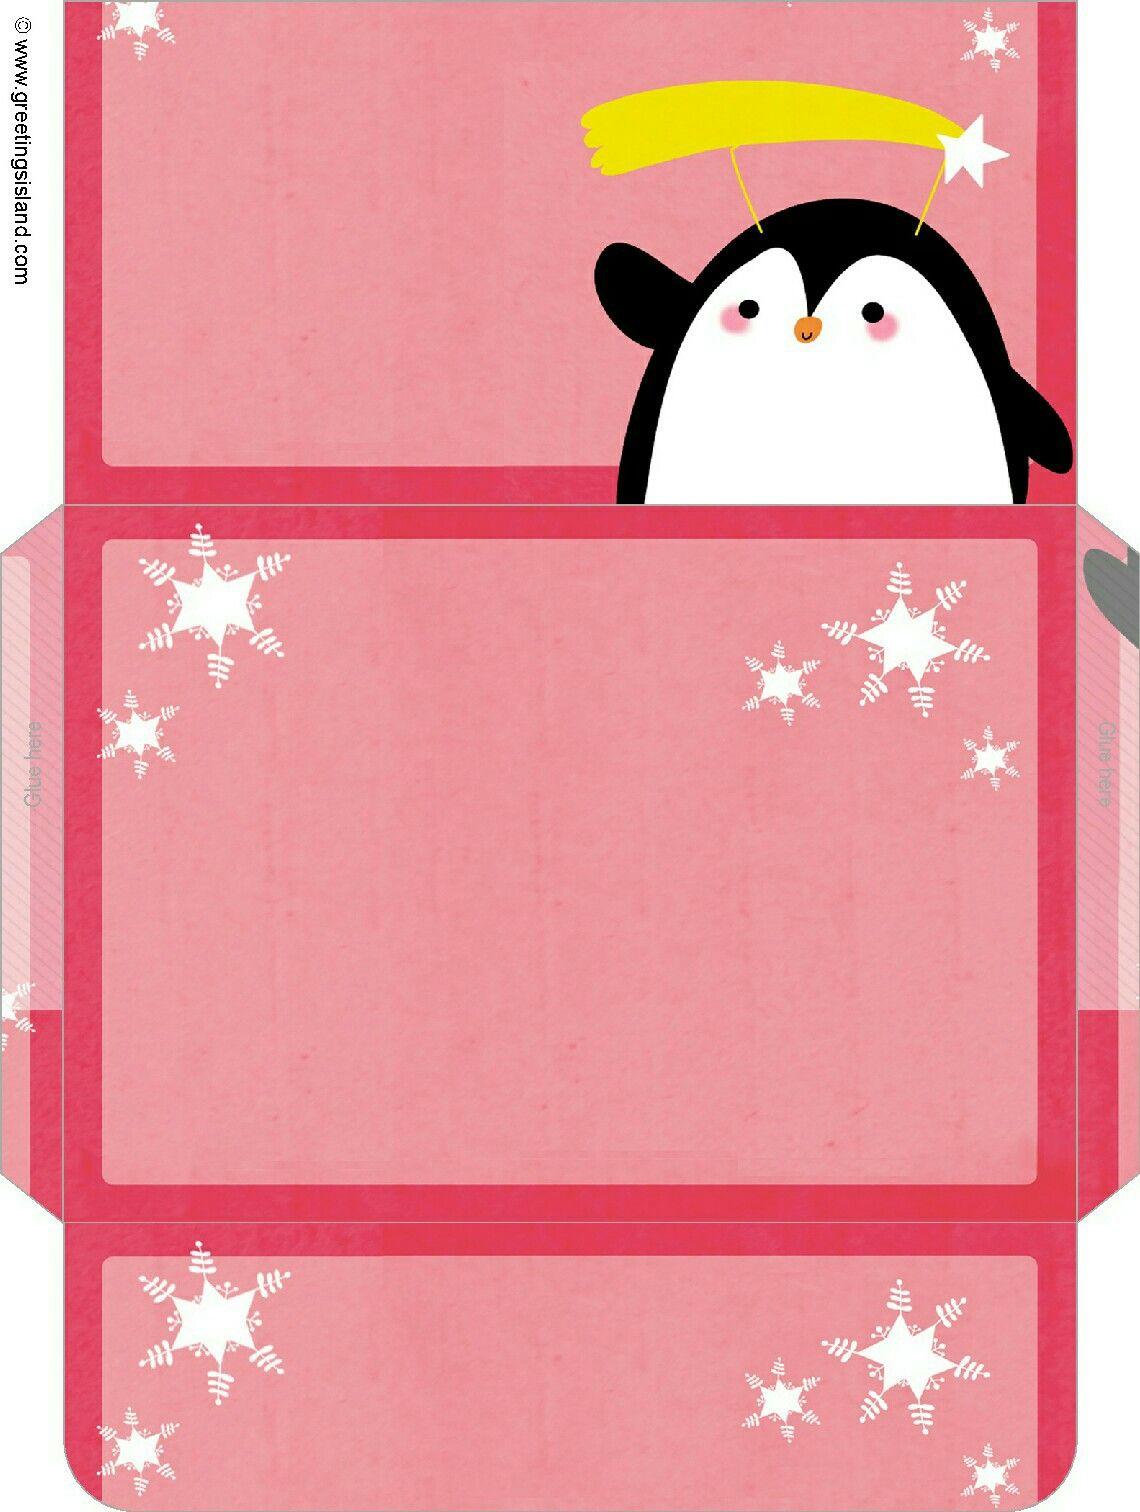 Sobre rosa con pingüino.